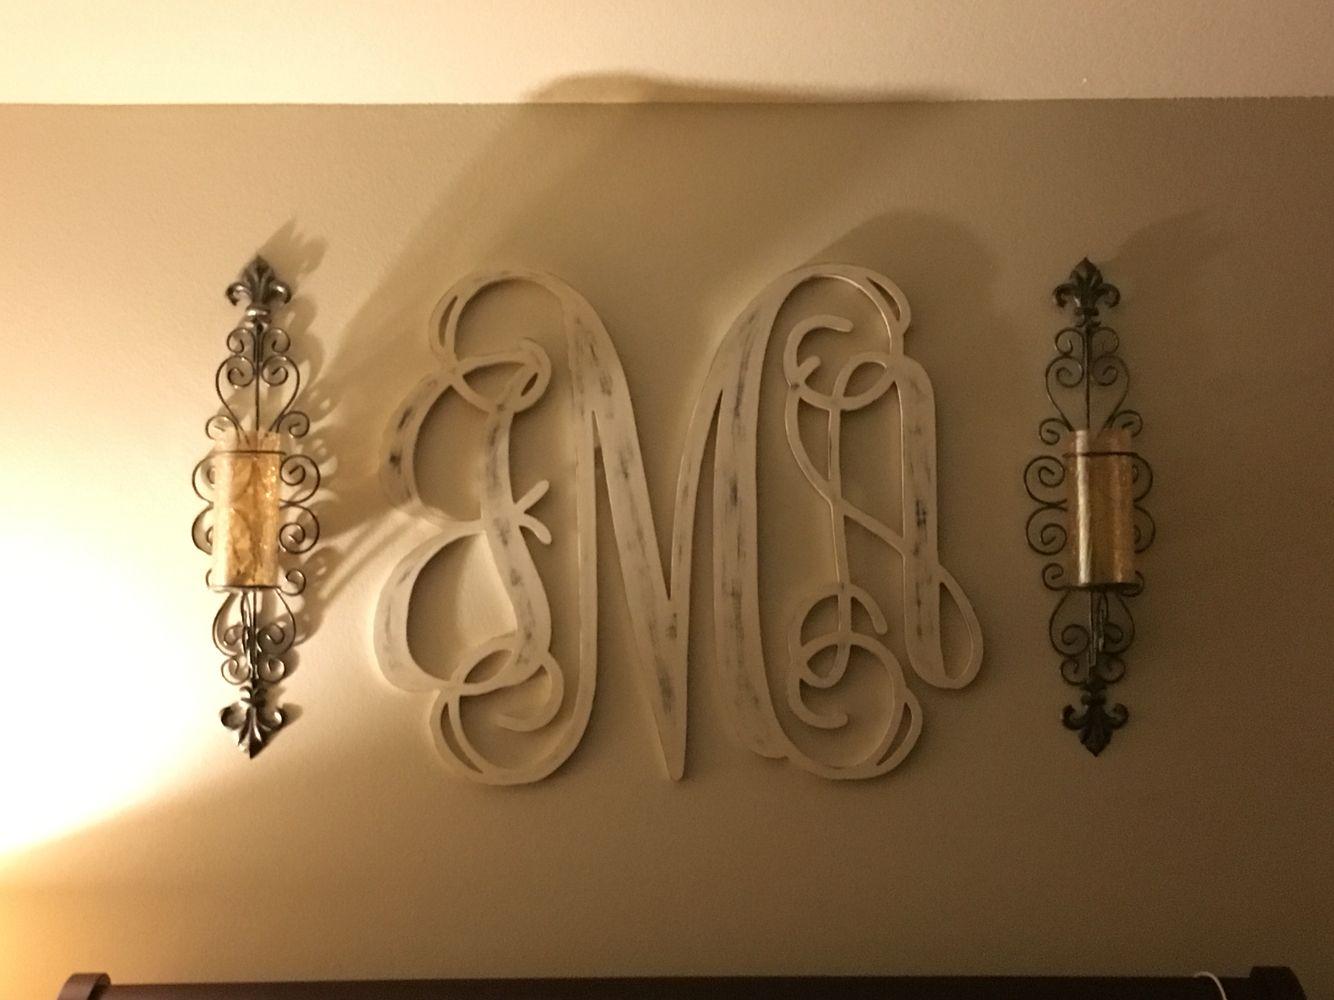 Monogram Decorations For Bedroom 17 Best Ideas About Monogram Above Bed On Pinterest Monogram